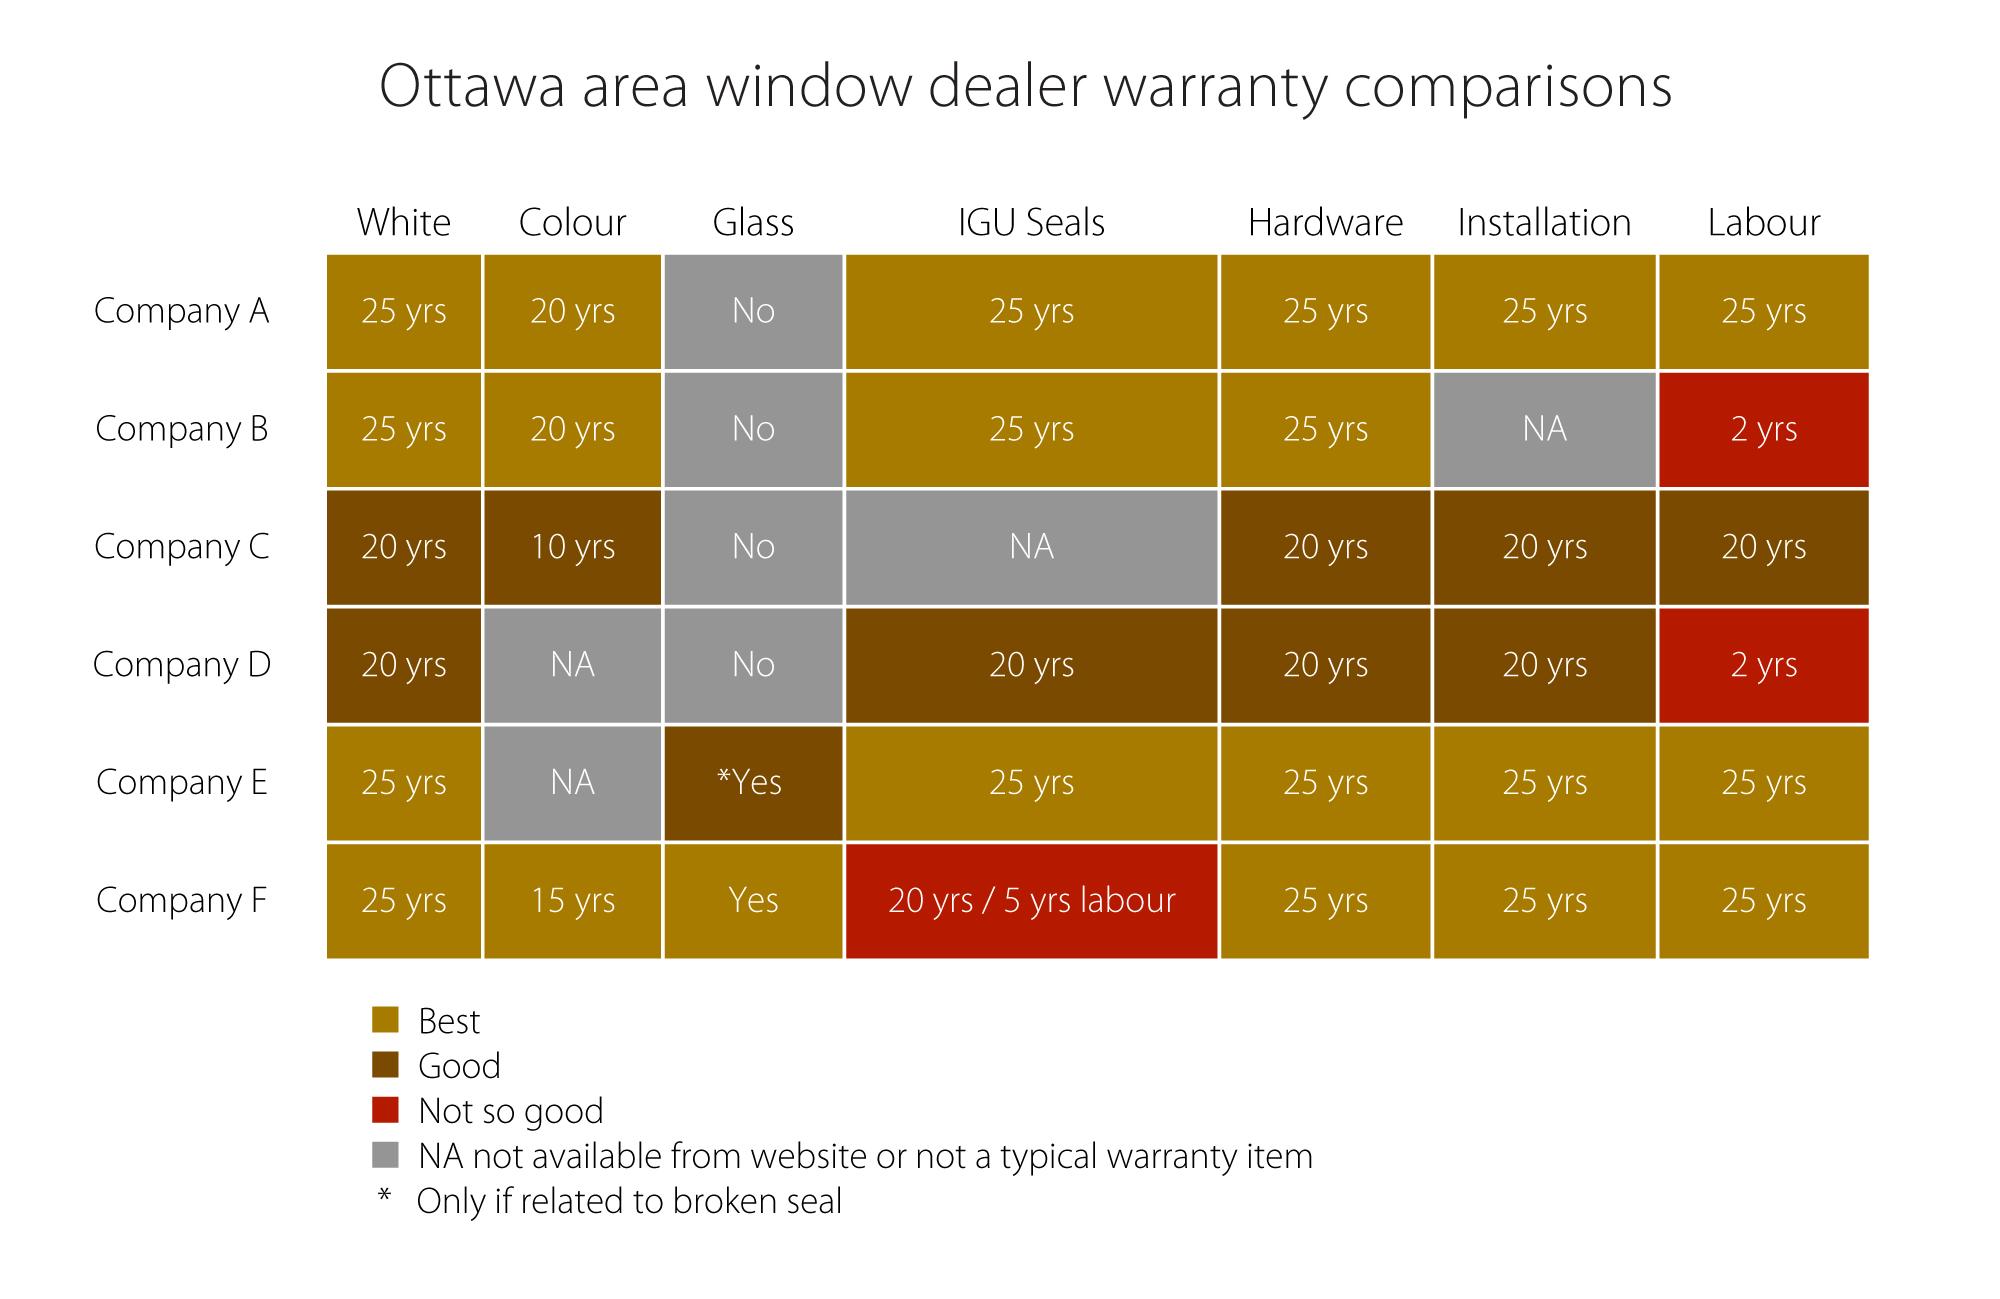 Ottawa Window Warranty Comparisons